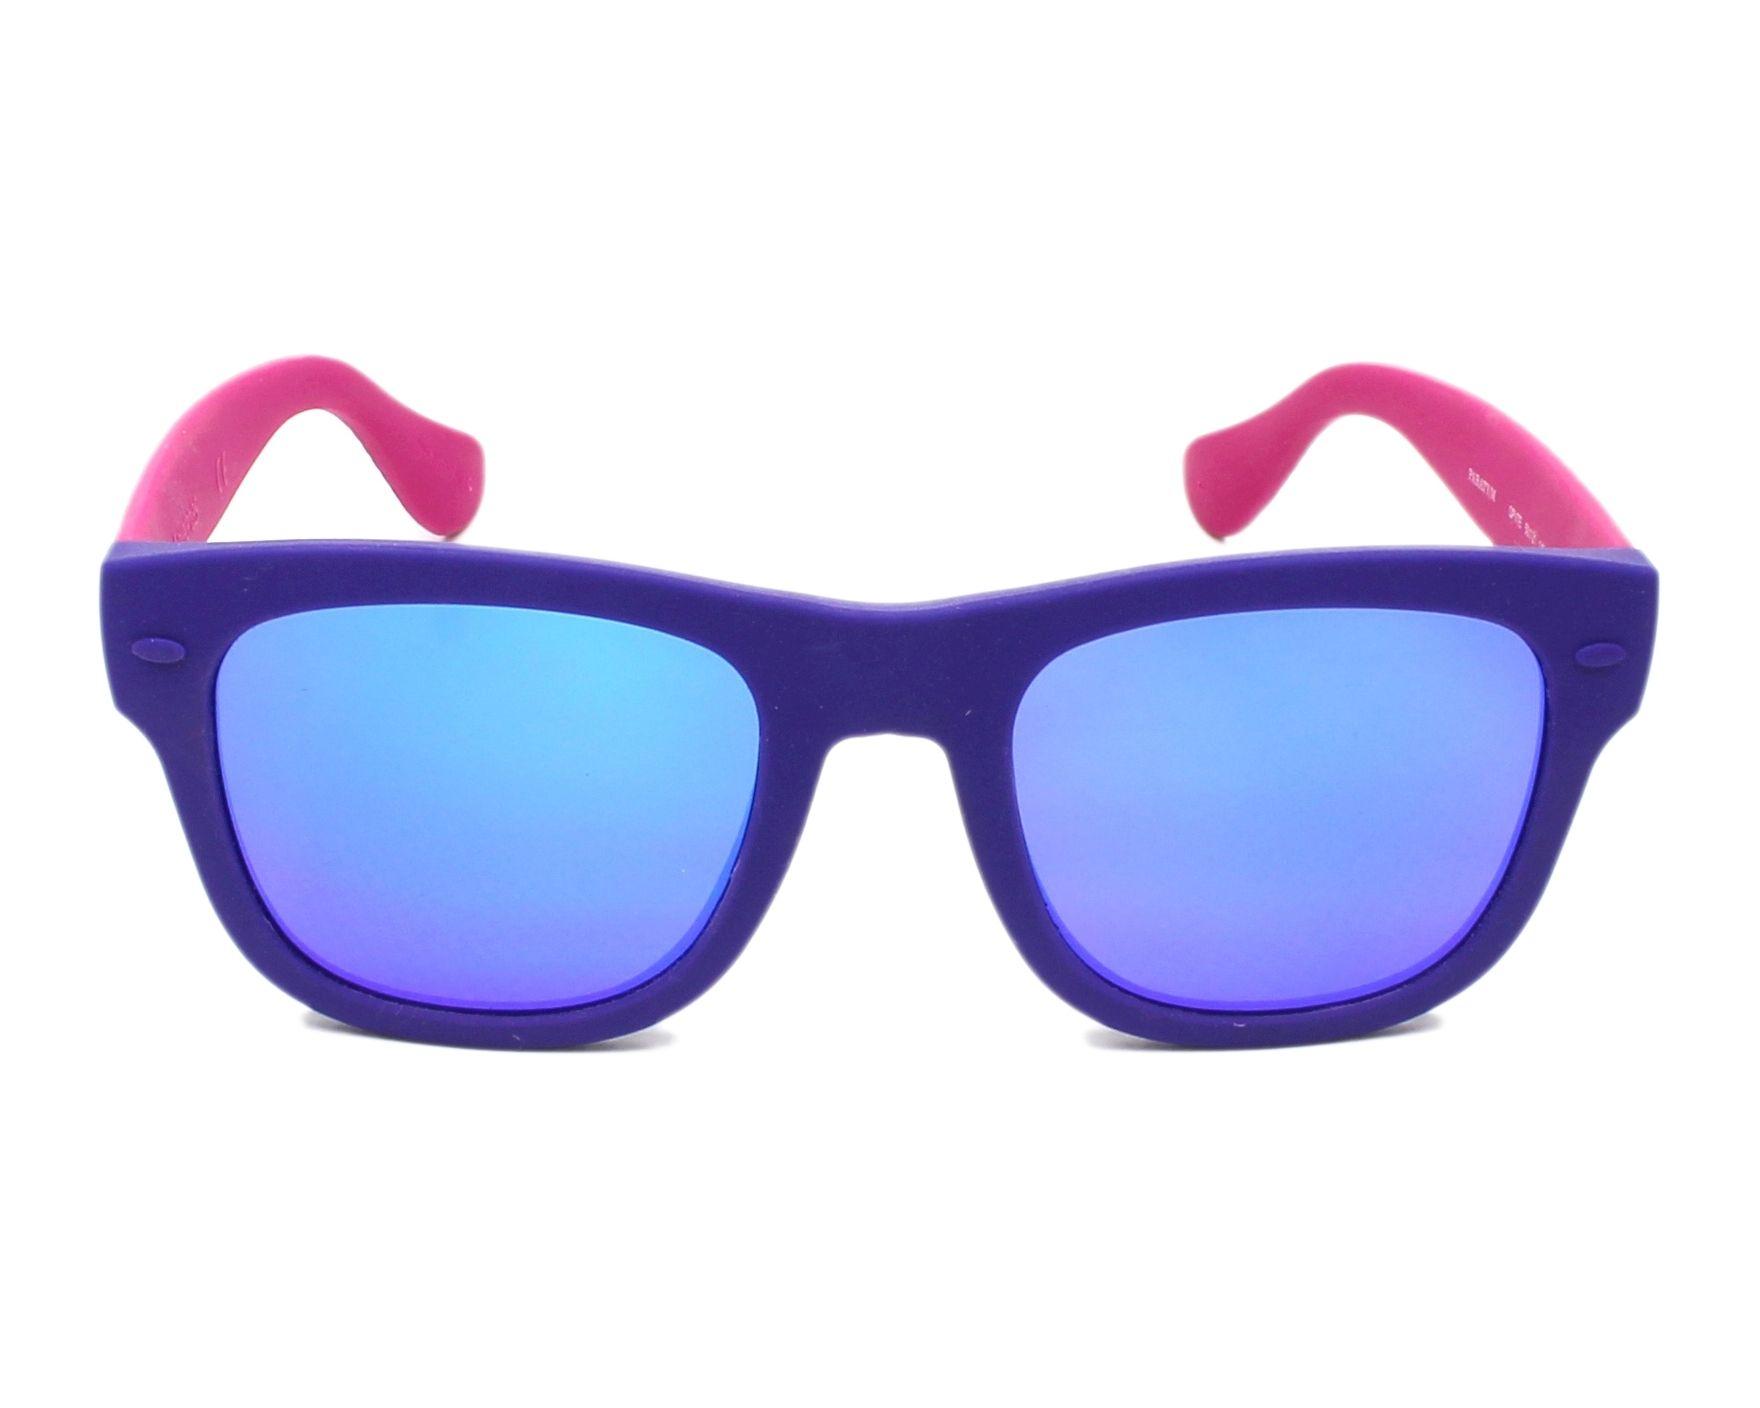 bfbe5546382 Sunglasses Havaianas PARATY-M QPV TE 50-21 Purple Fuchsia front view